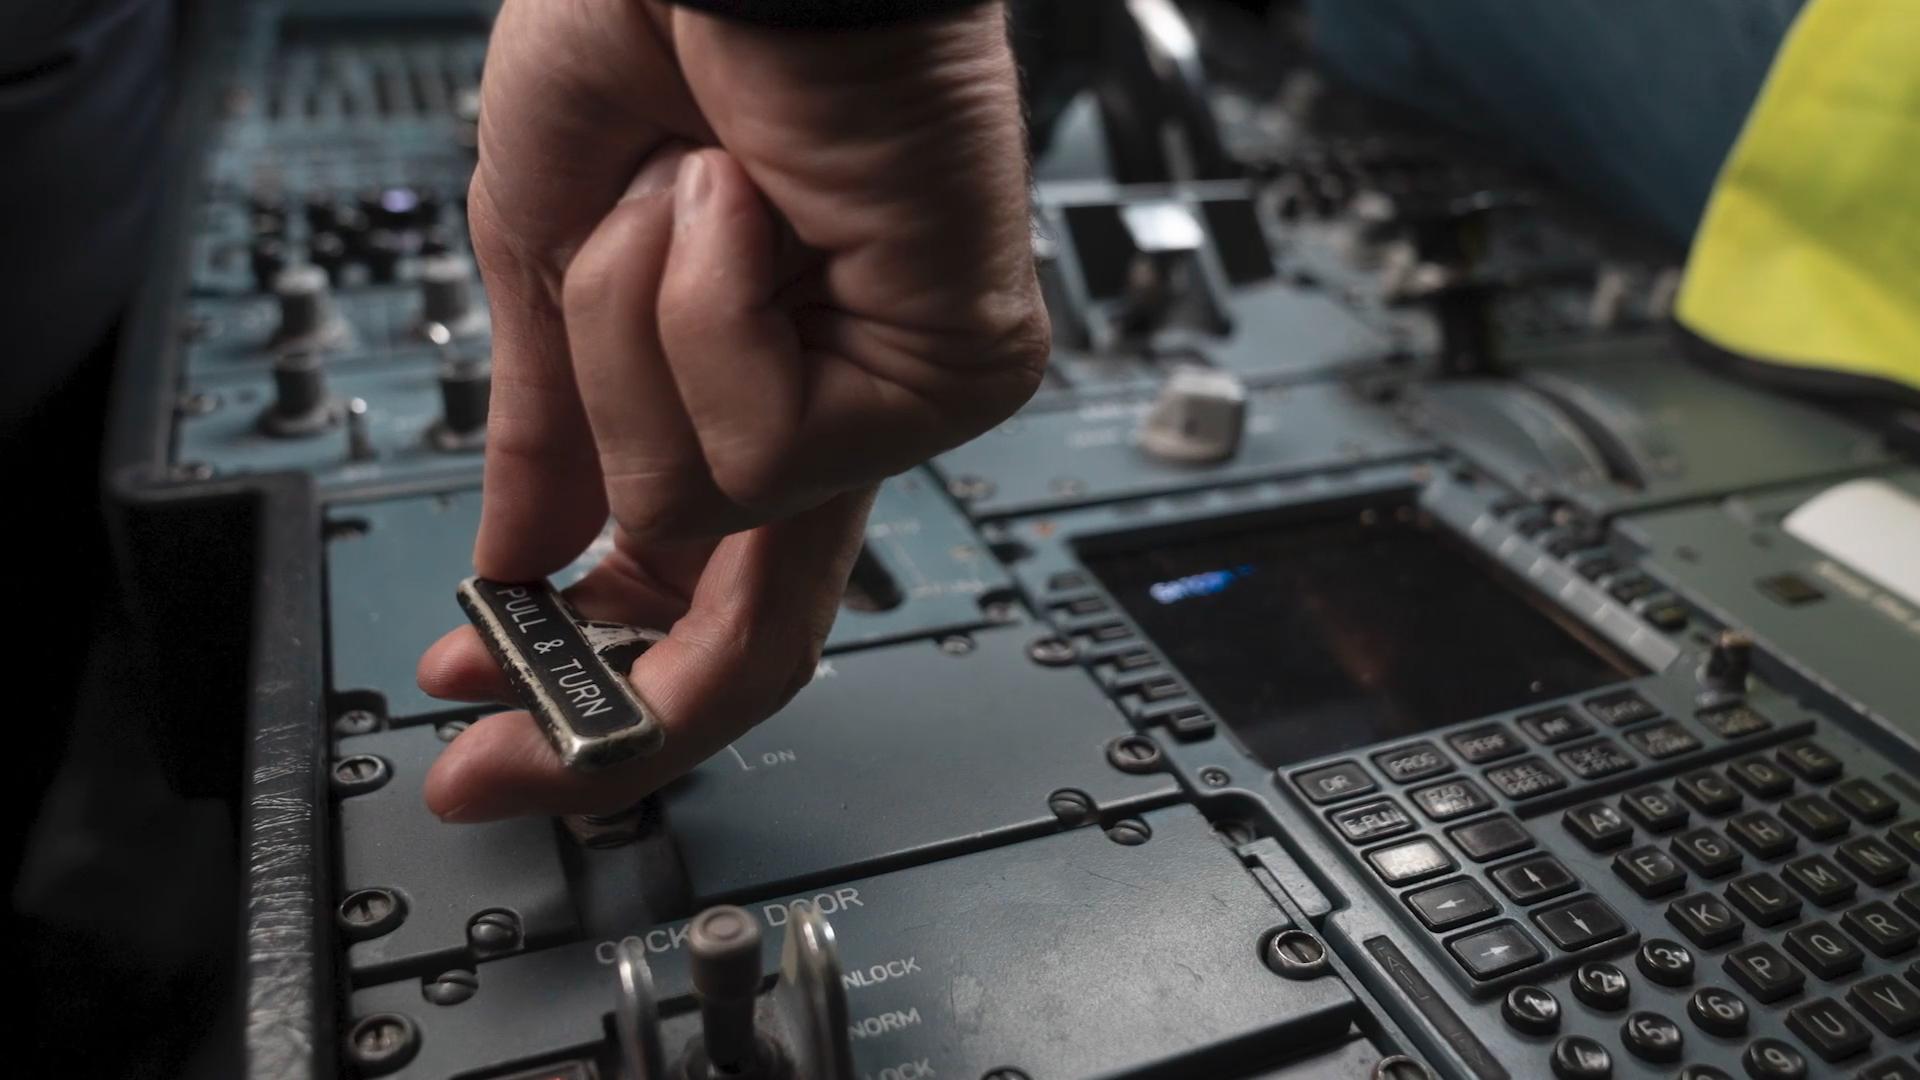 AEL Flight Service Rafael de Amorim Videographer Manchester